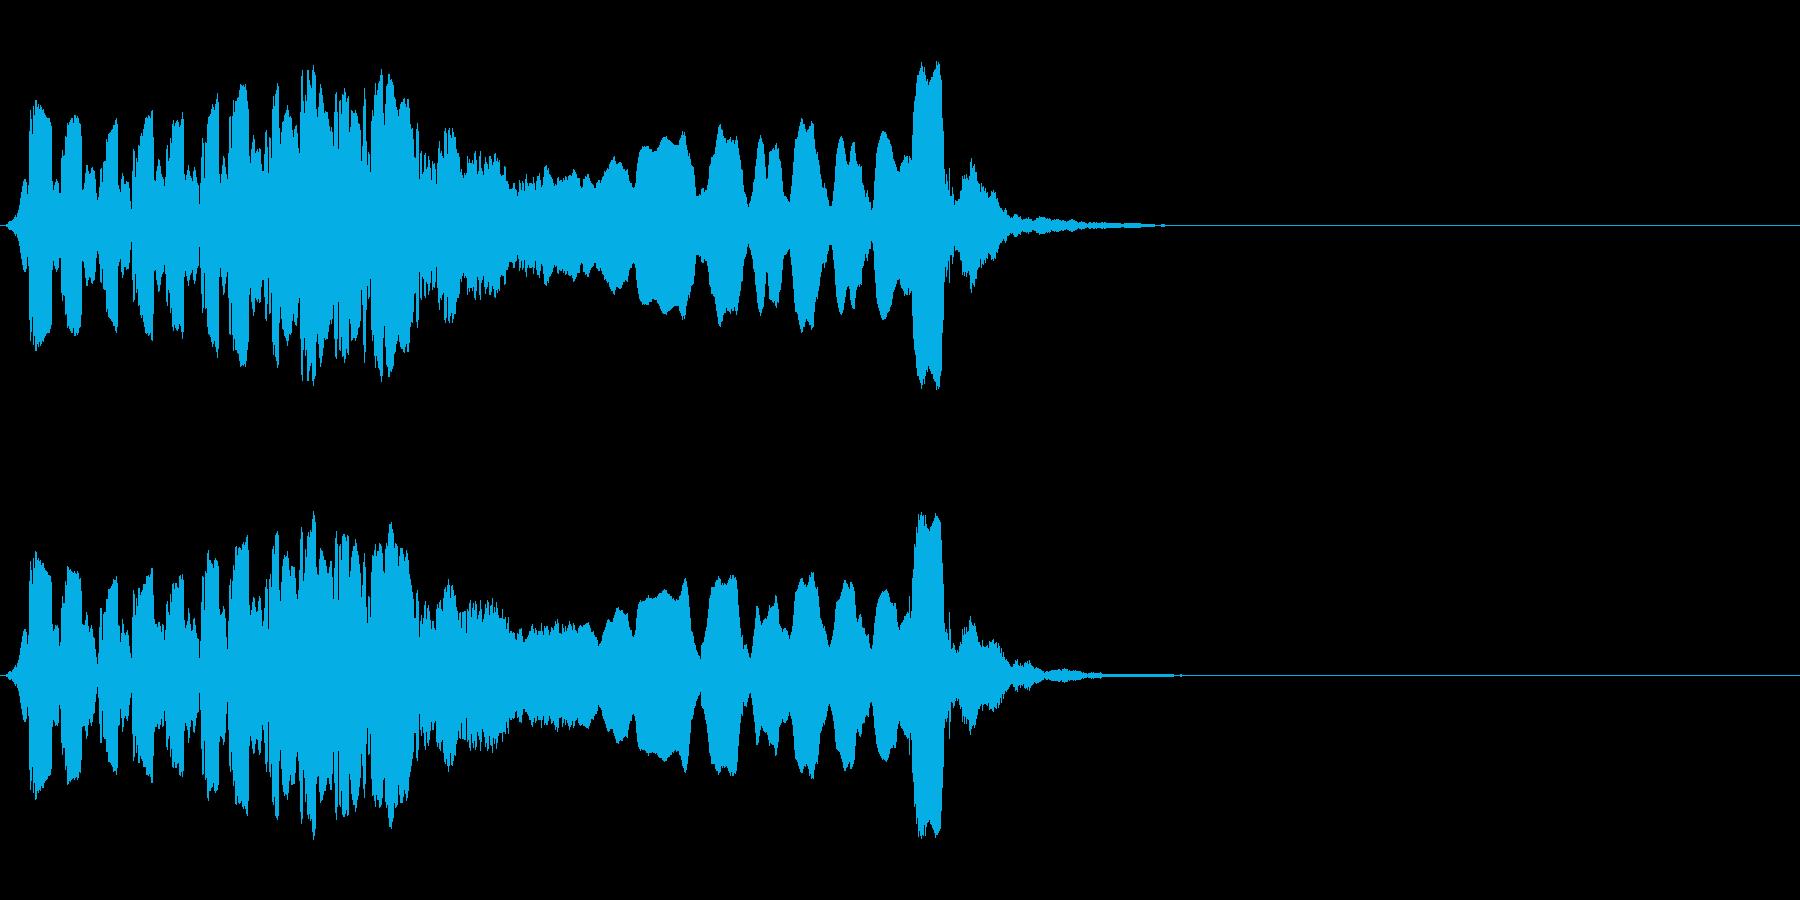 尺八 生演奏 古典風 残響音有 #10の再生済みの波形